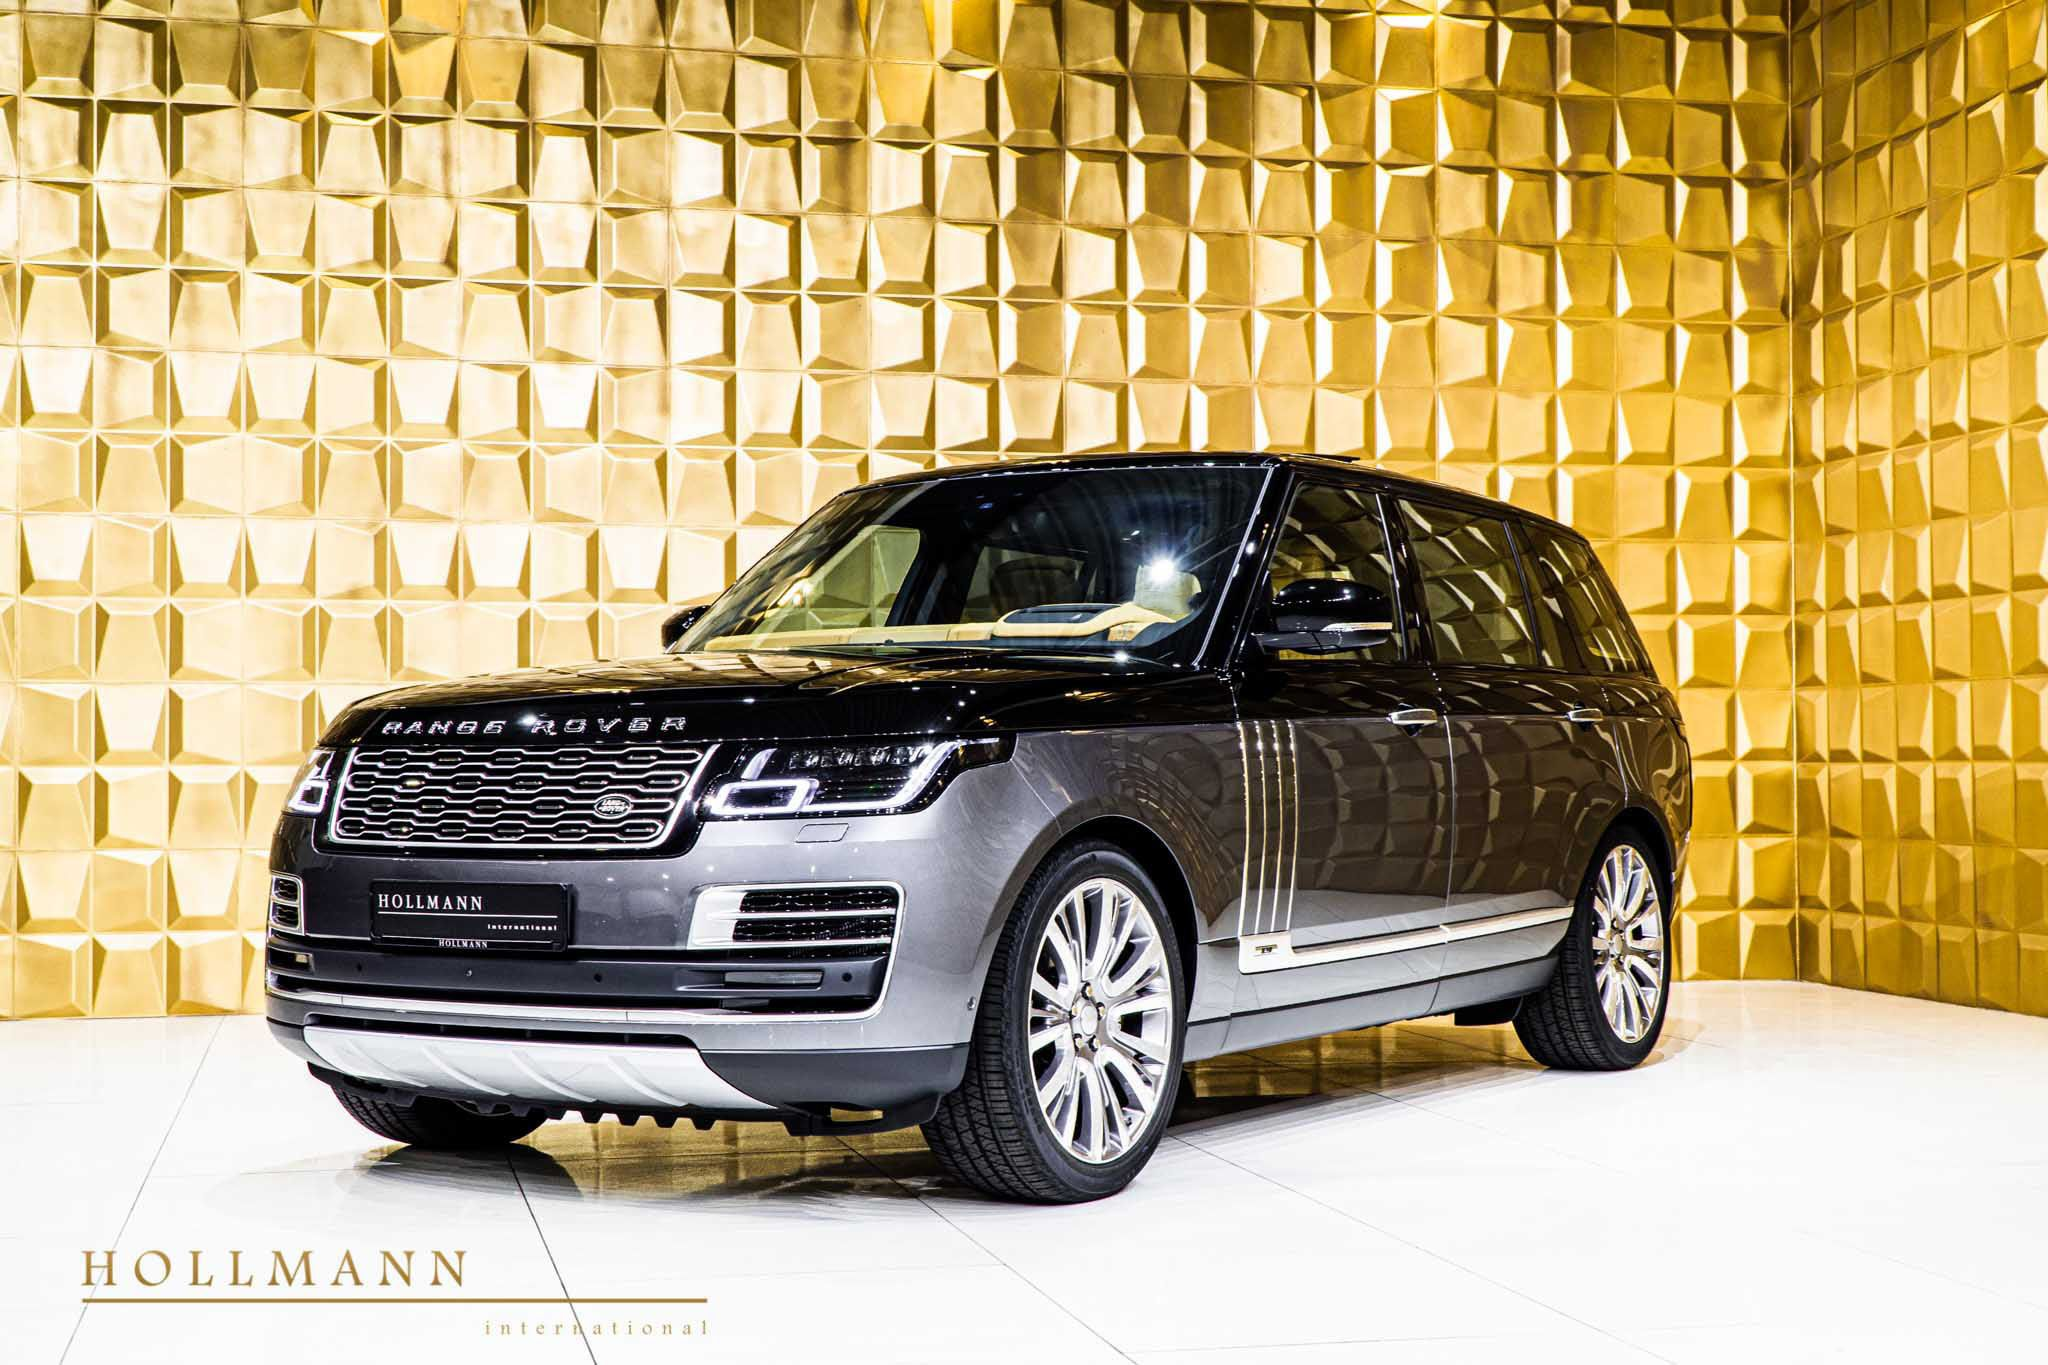 Land Rover Range Rover 5 0 Lwb Sv Autobiography Hollmann International Germany For Sale On Luxurypulse In 2021 Range Rover Land Rover Range Rover Supercharged